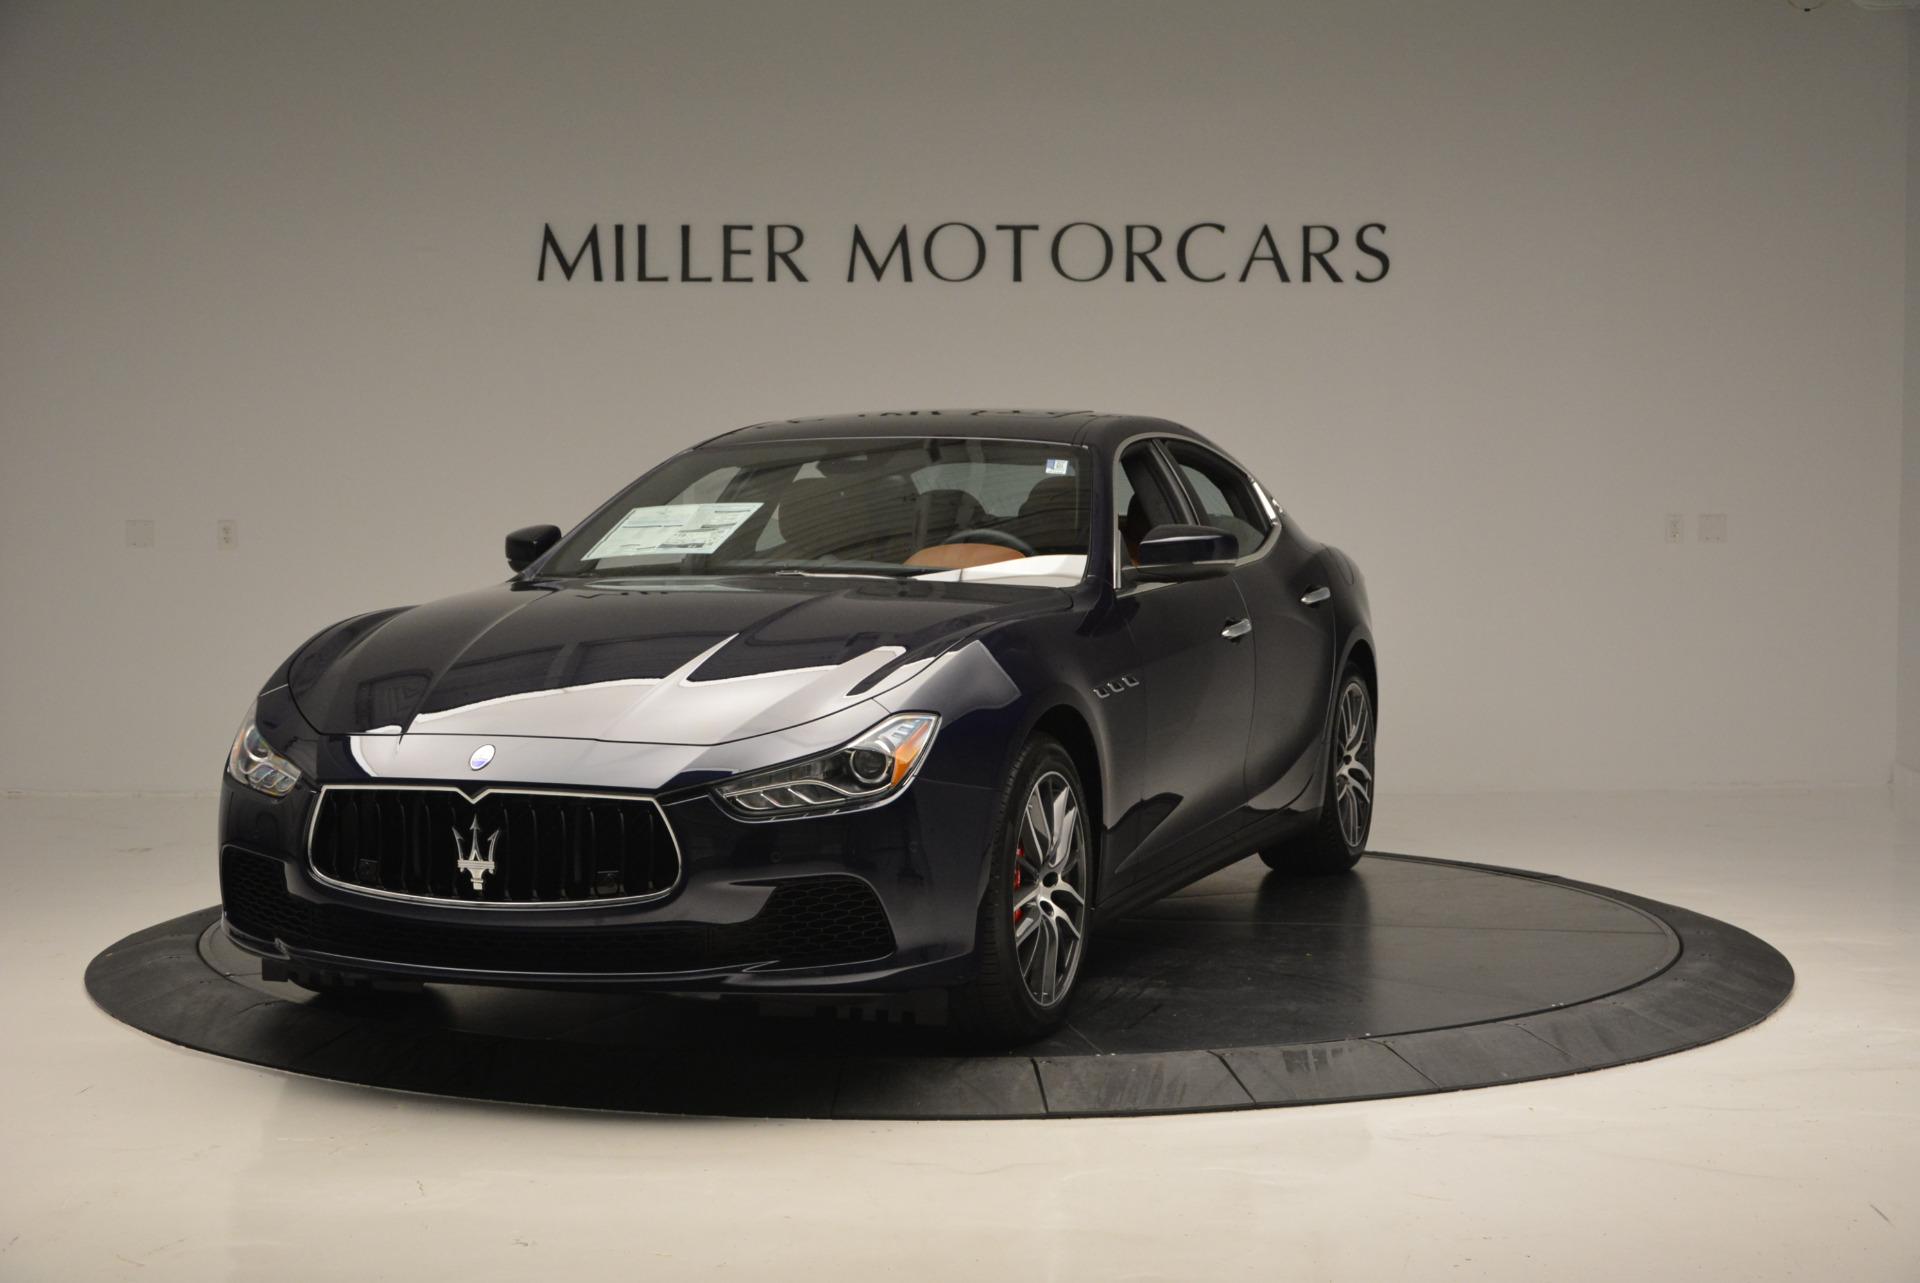 Used 2017 Maserati Ghibli S Q4 - EX Loaner For Sale In Greenwich, CT 568_main